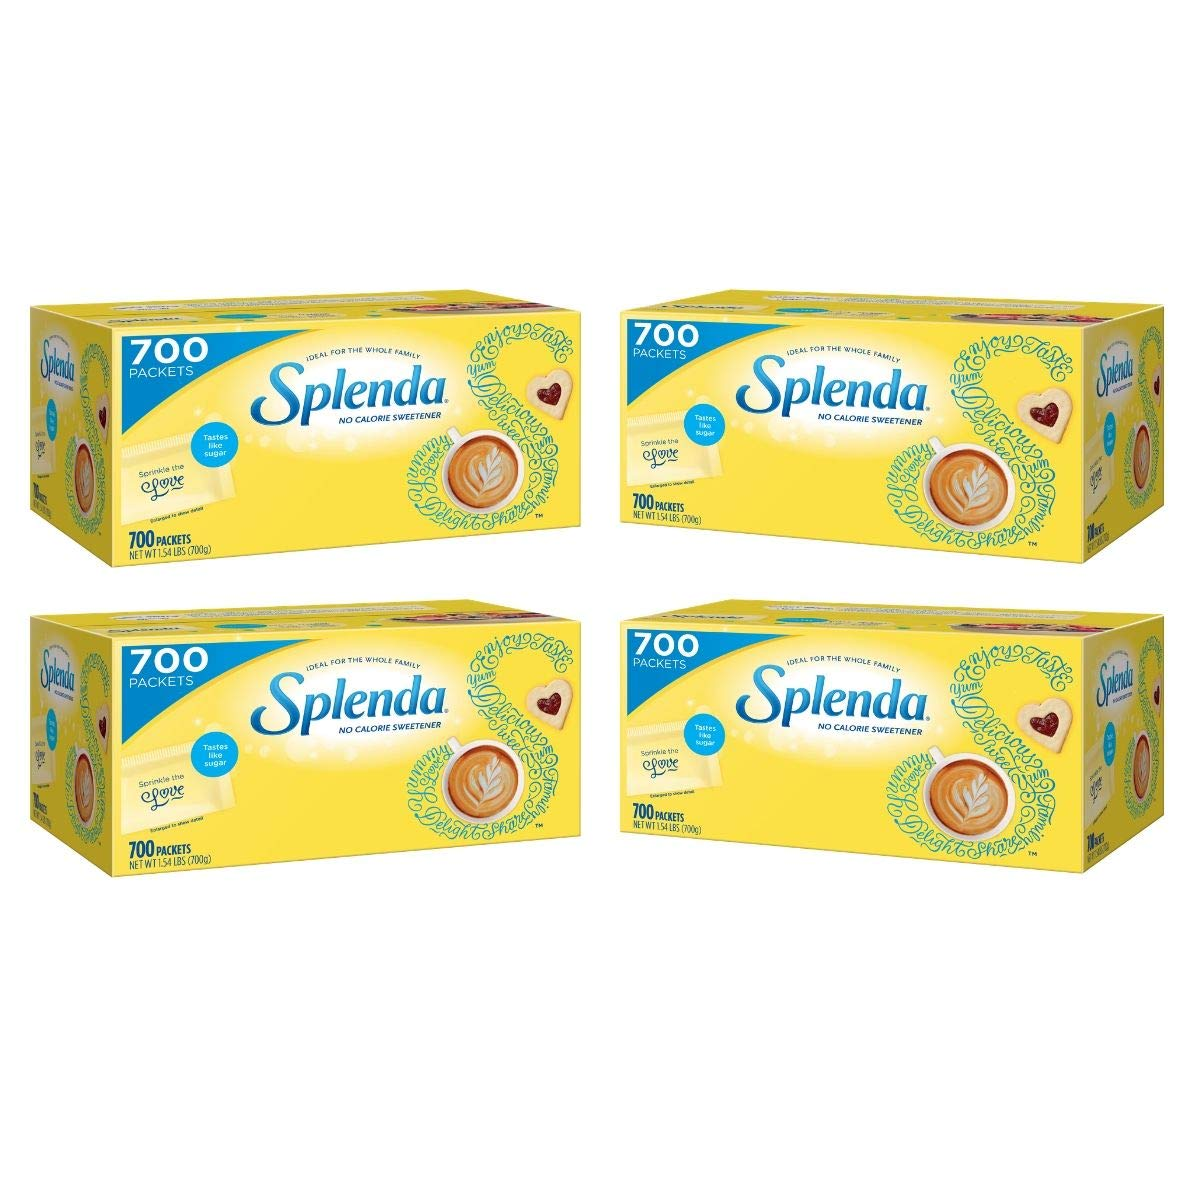 (700 Packets) Splenda No Calorie Sweetener Packets (Pack of 4)